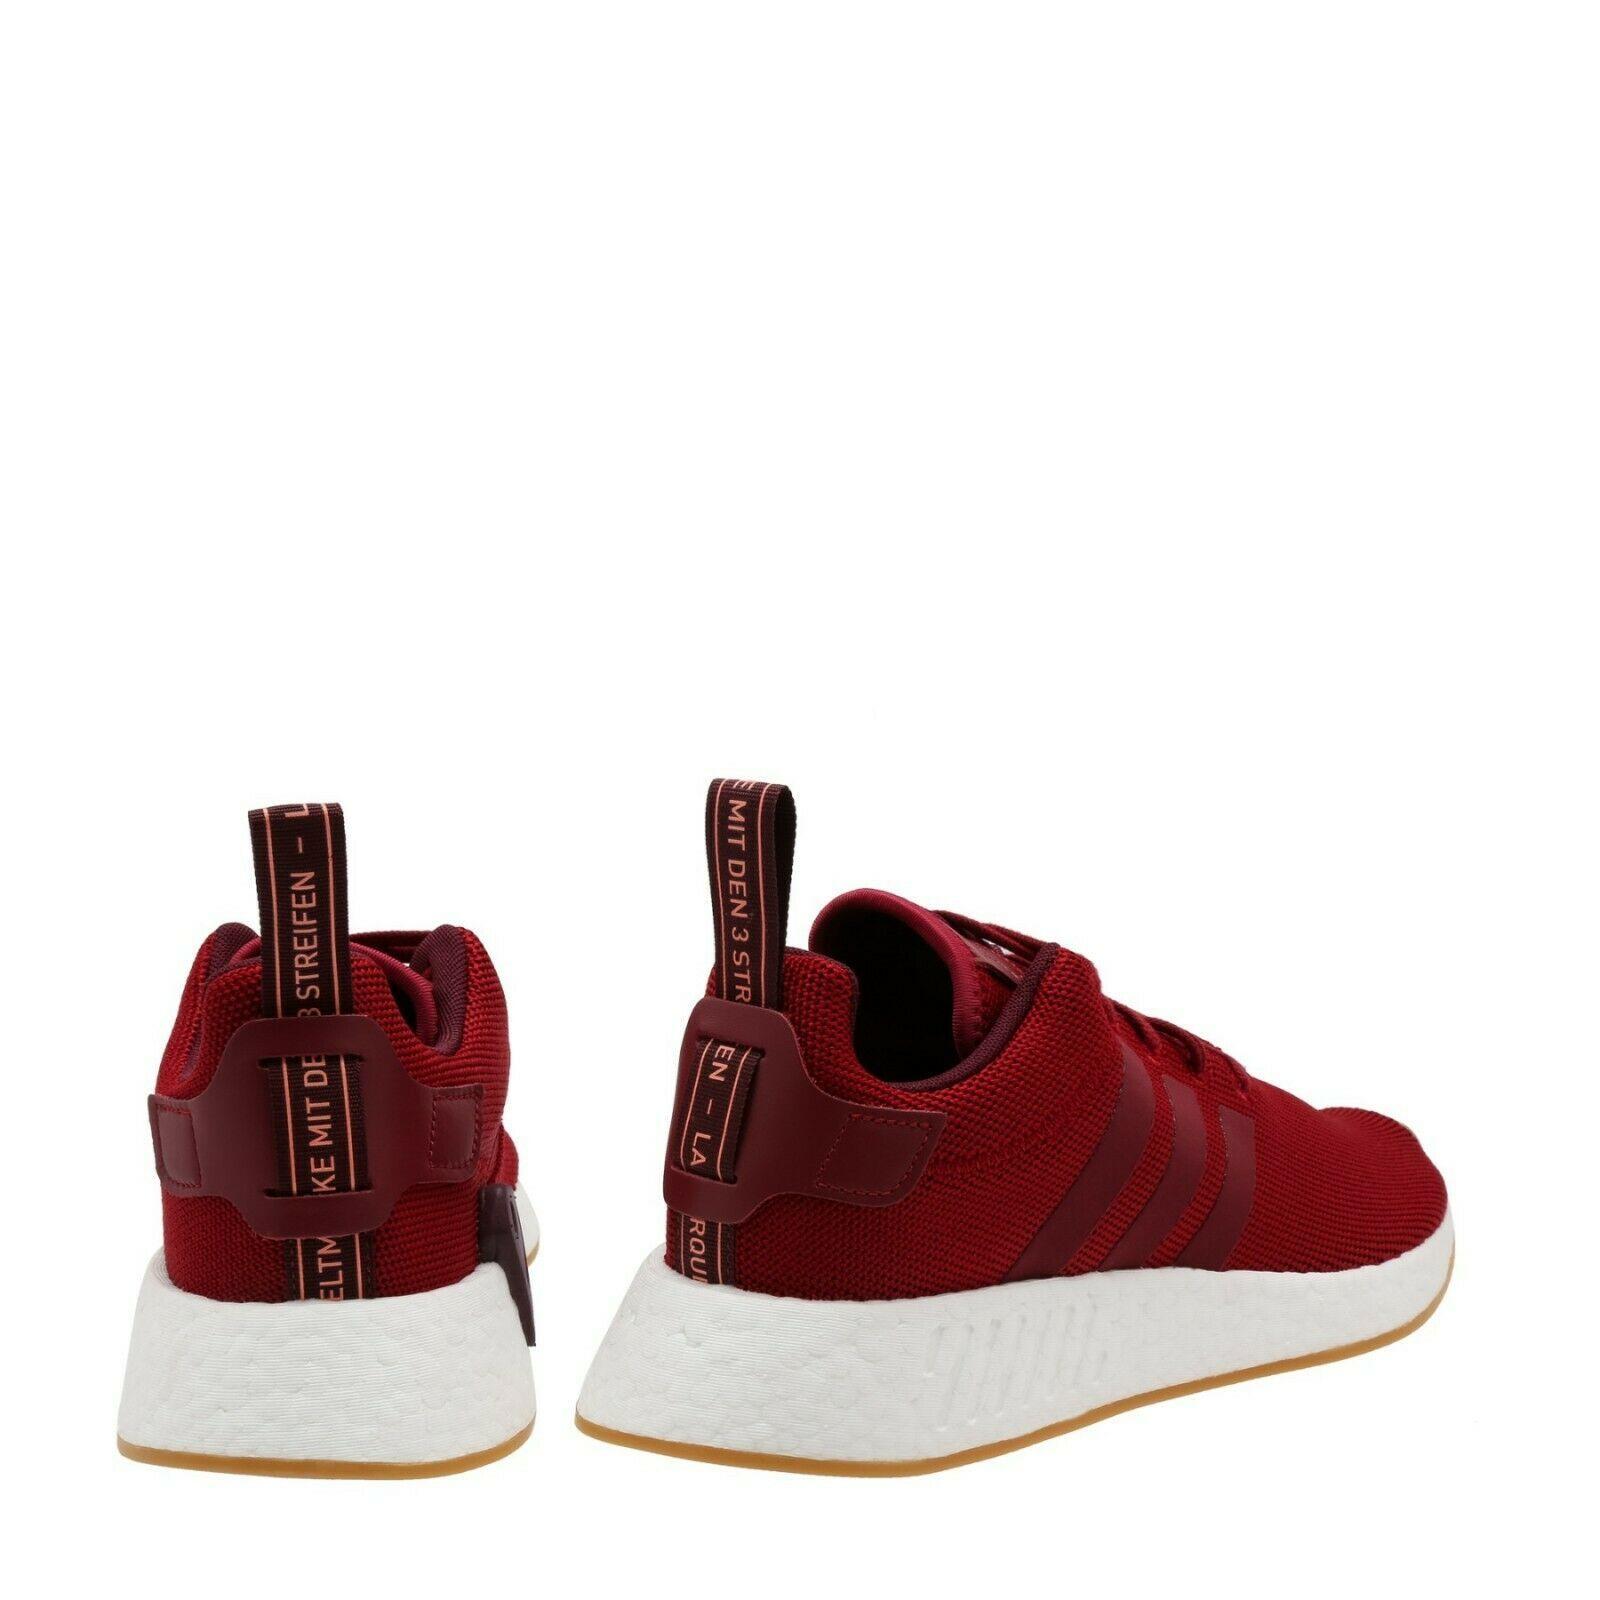 adidas nmd r2 cq2404 burgundowe rozmiar 39 5